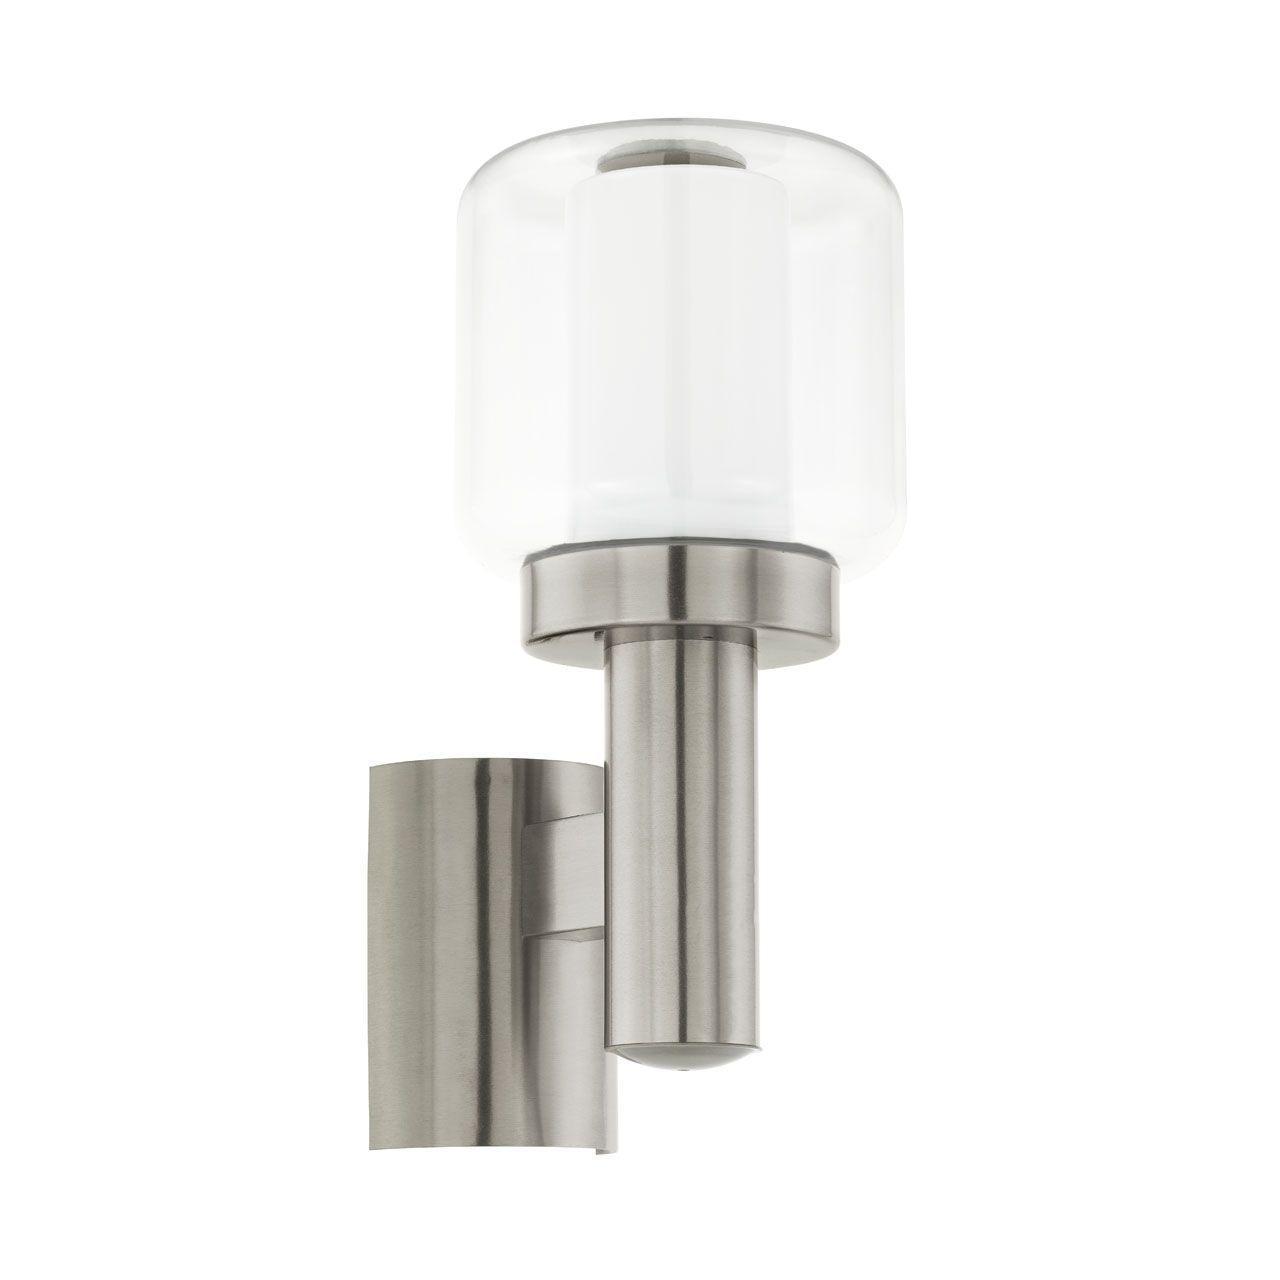 Уличный настенный светильник Eglo Poliento 95016 уличный столб kolarz futura 95016 1000 ne